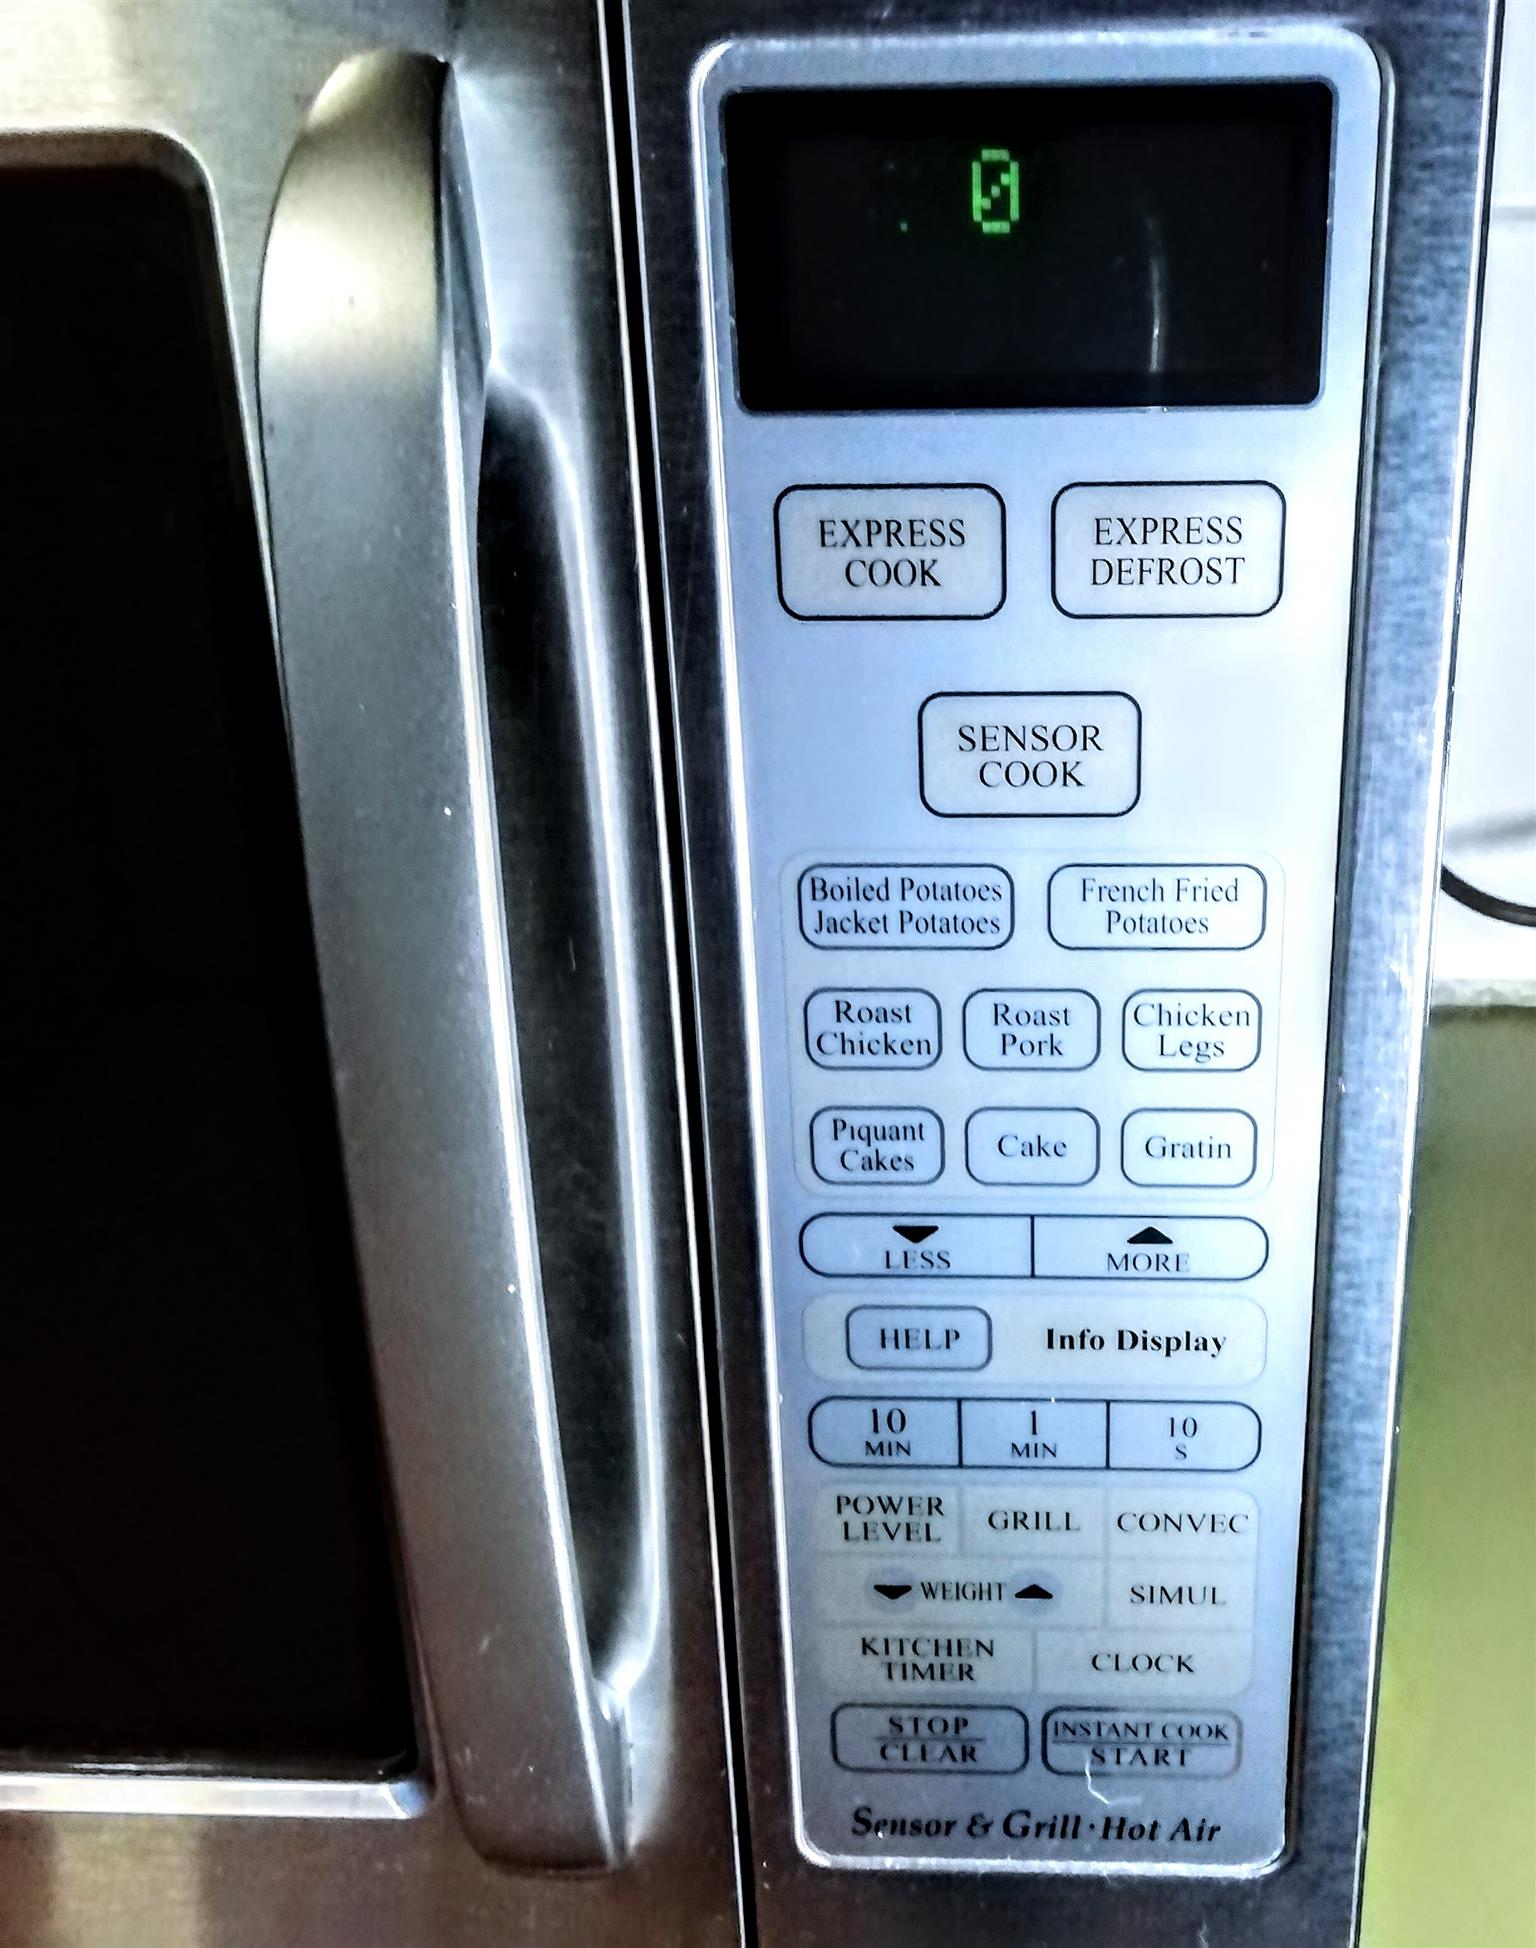 Sharp Convection Smart Microwave